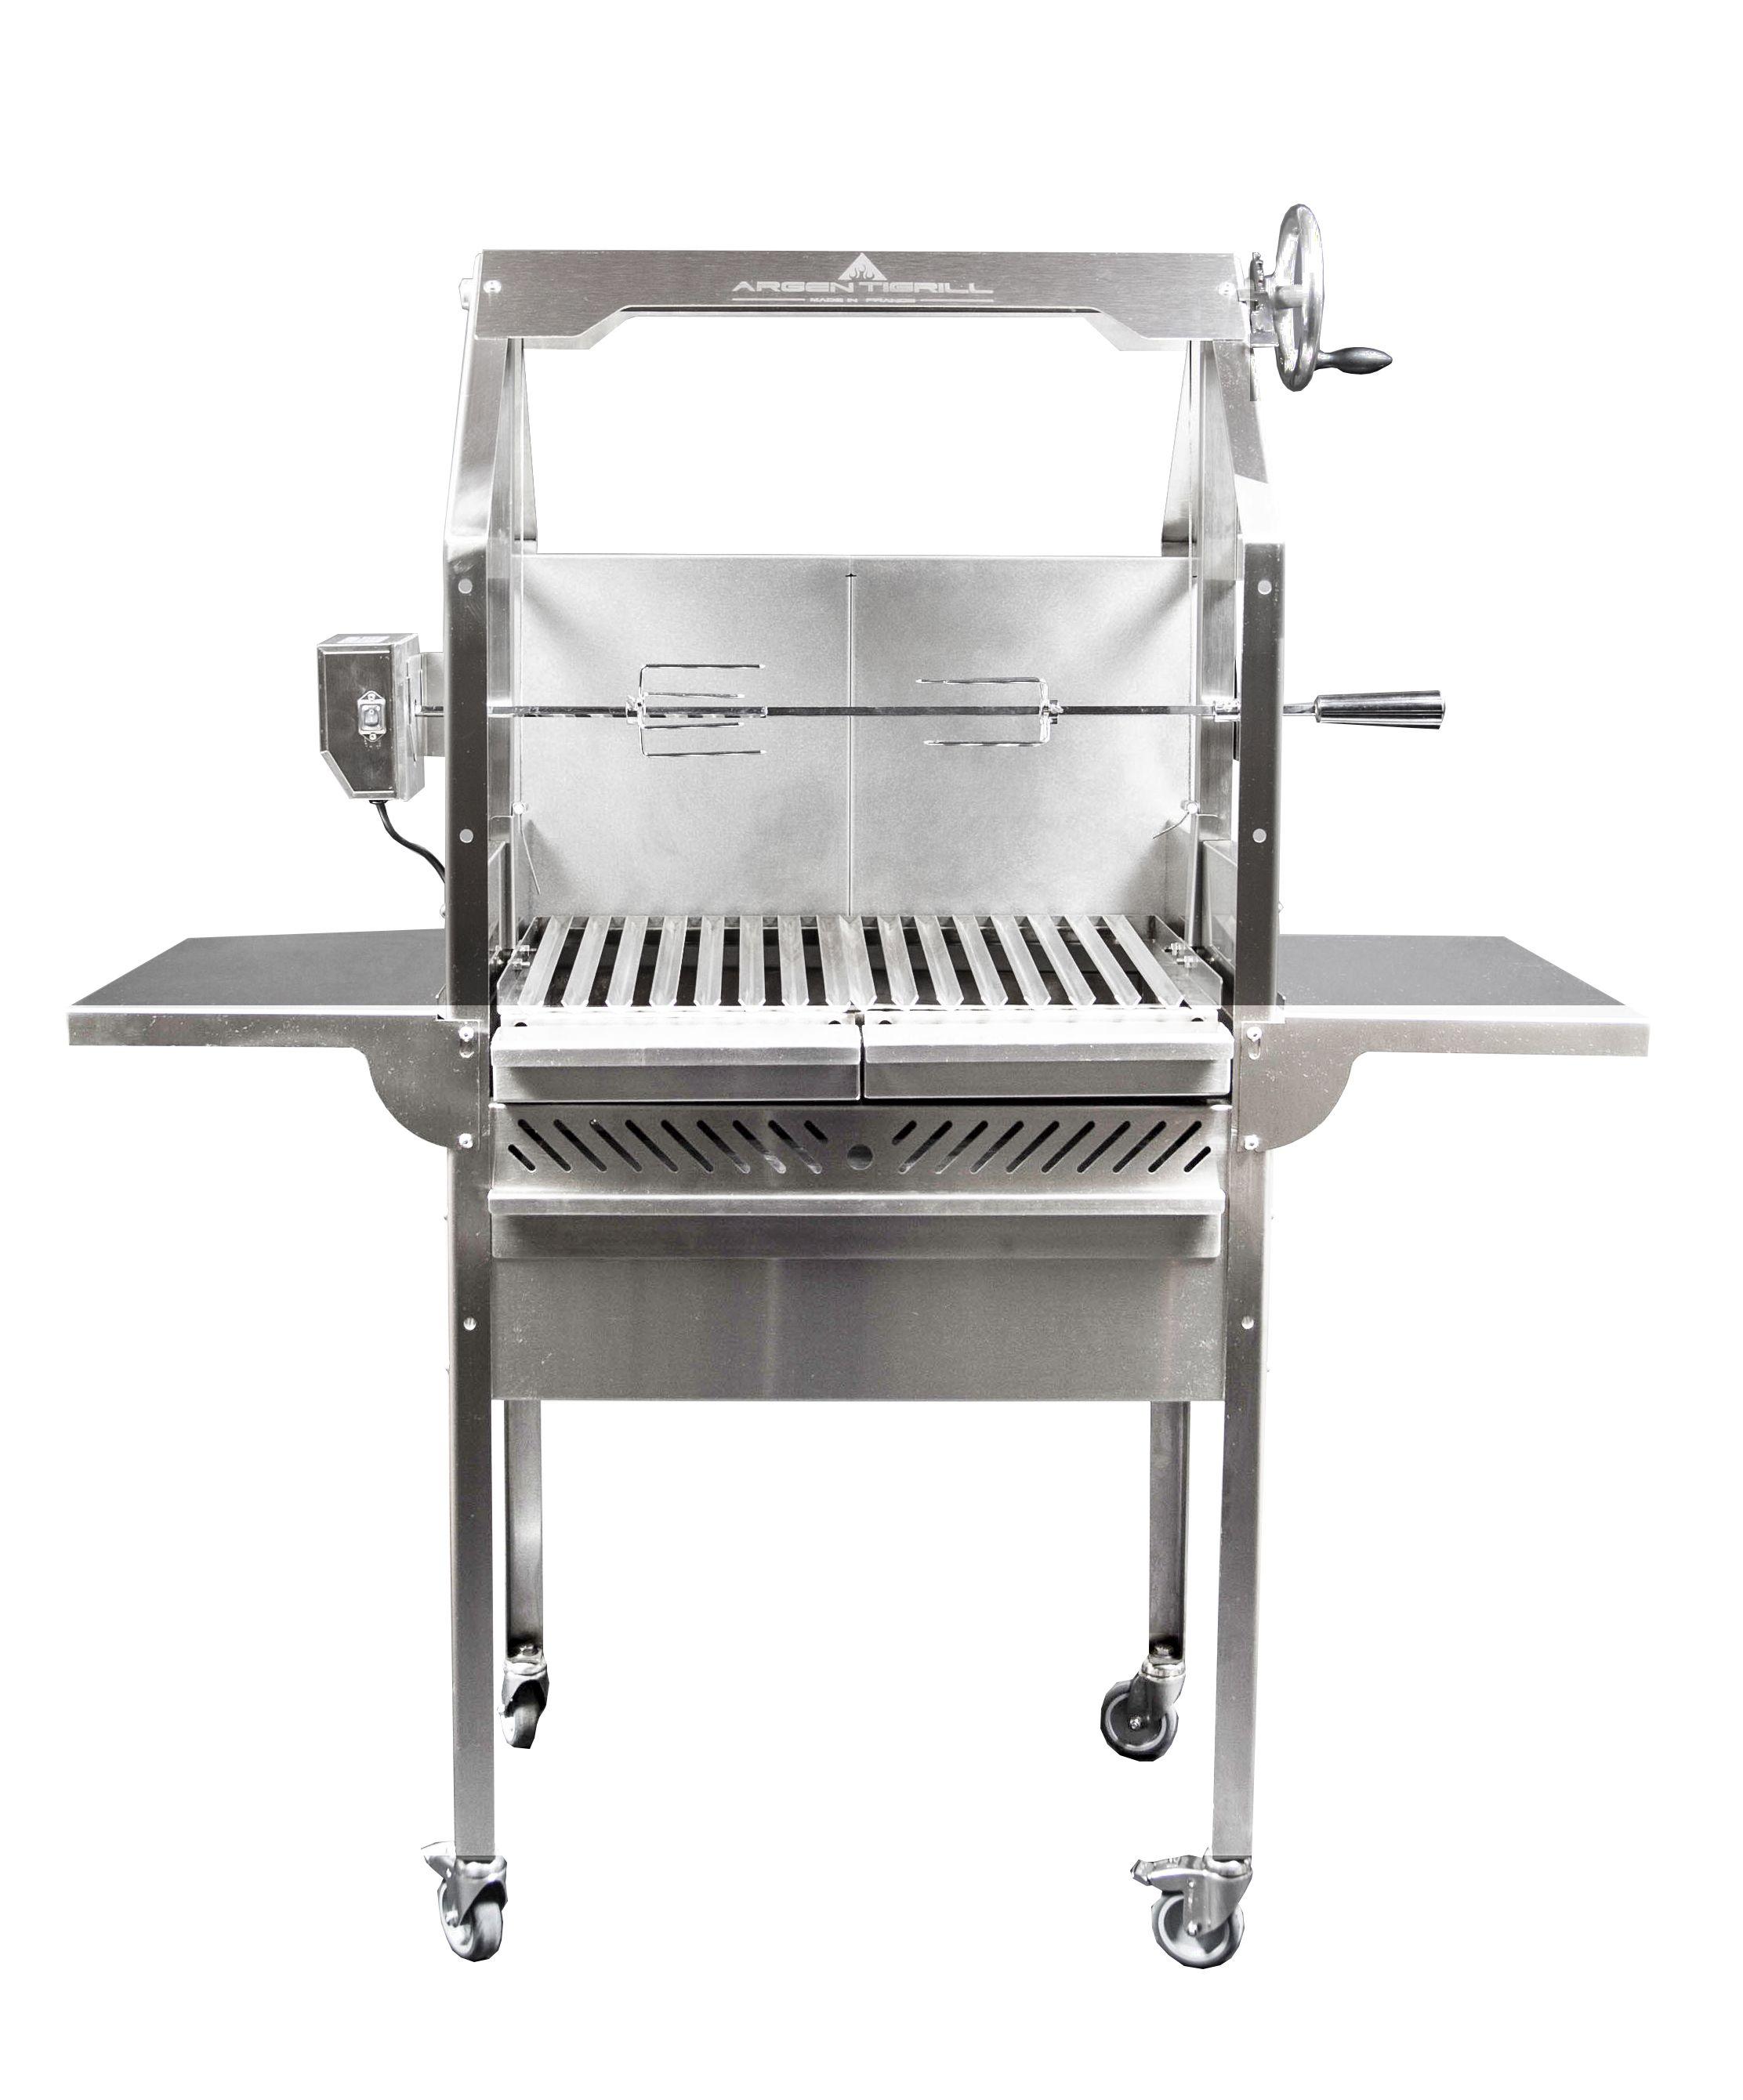 argentigrill barbecue mobile grill argentin argentigrill pinterest barbecues. Black Bedroom Furniture Sets. Home Design Ideas